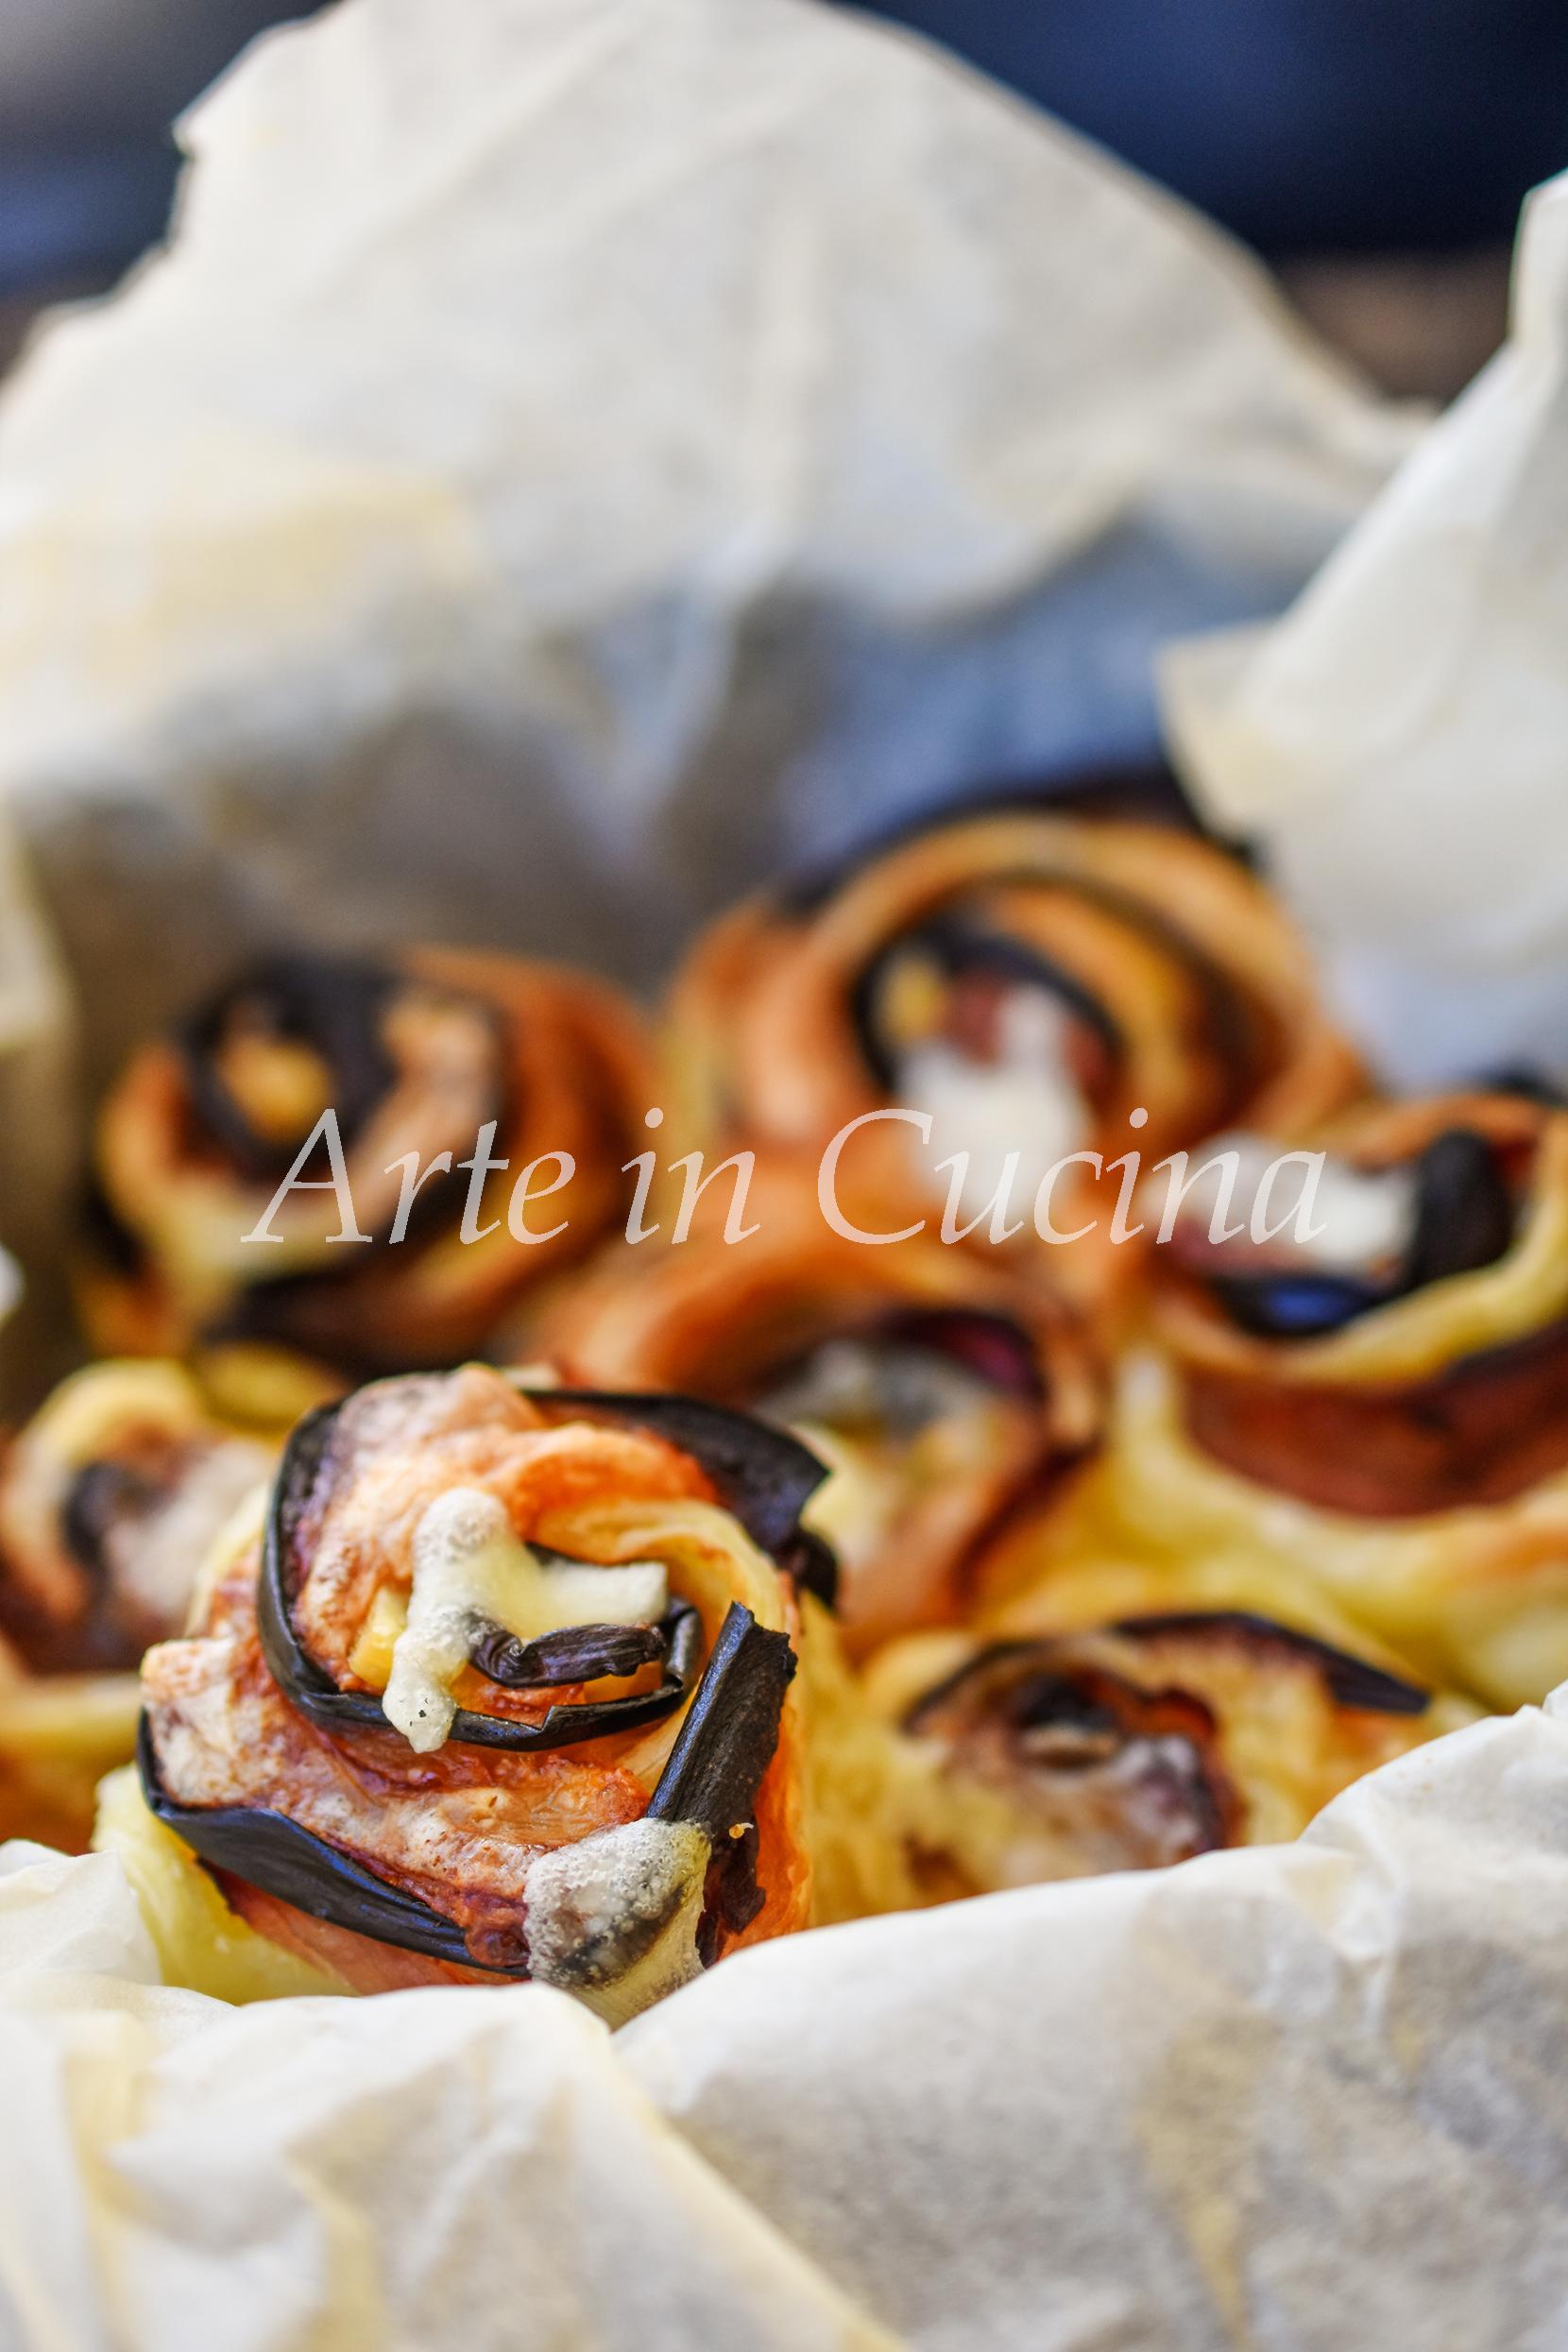 Torta di rose melanzane e prosciutto veloce vickyart arte in cucina